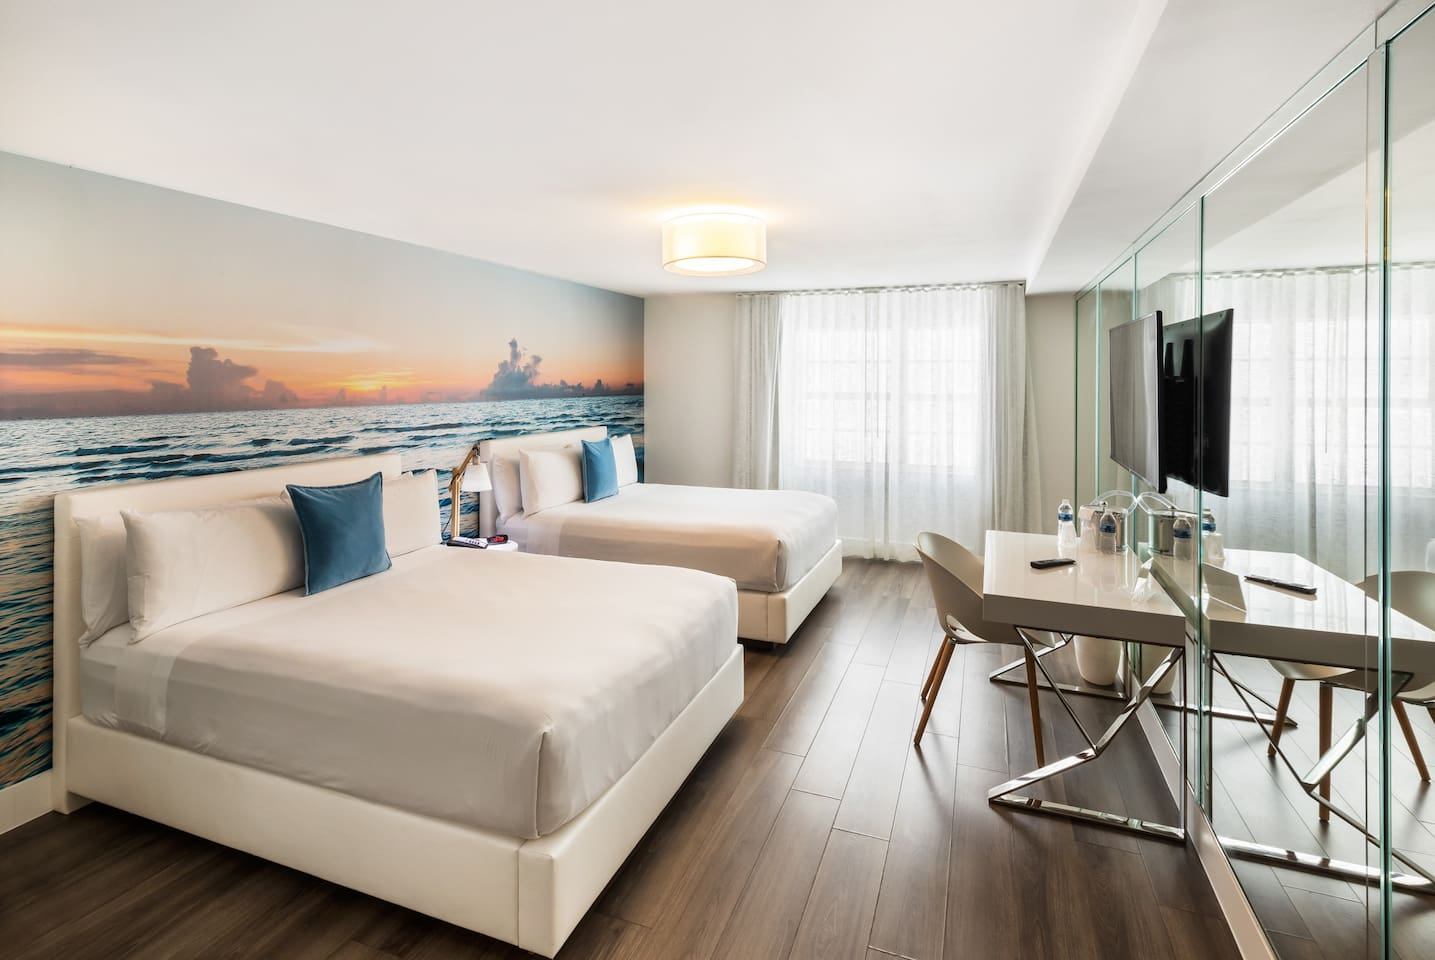 Room view - Spacious Quadruple Room